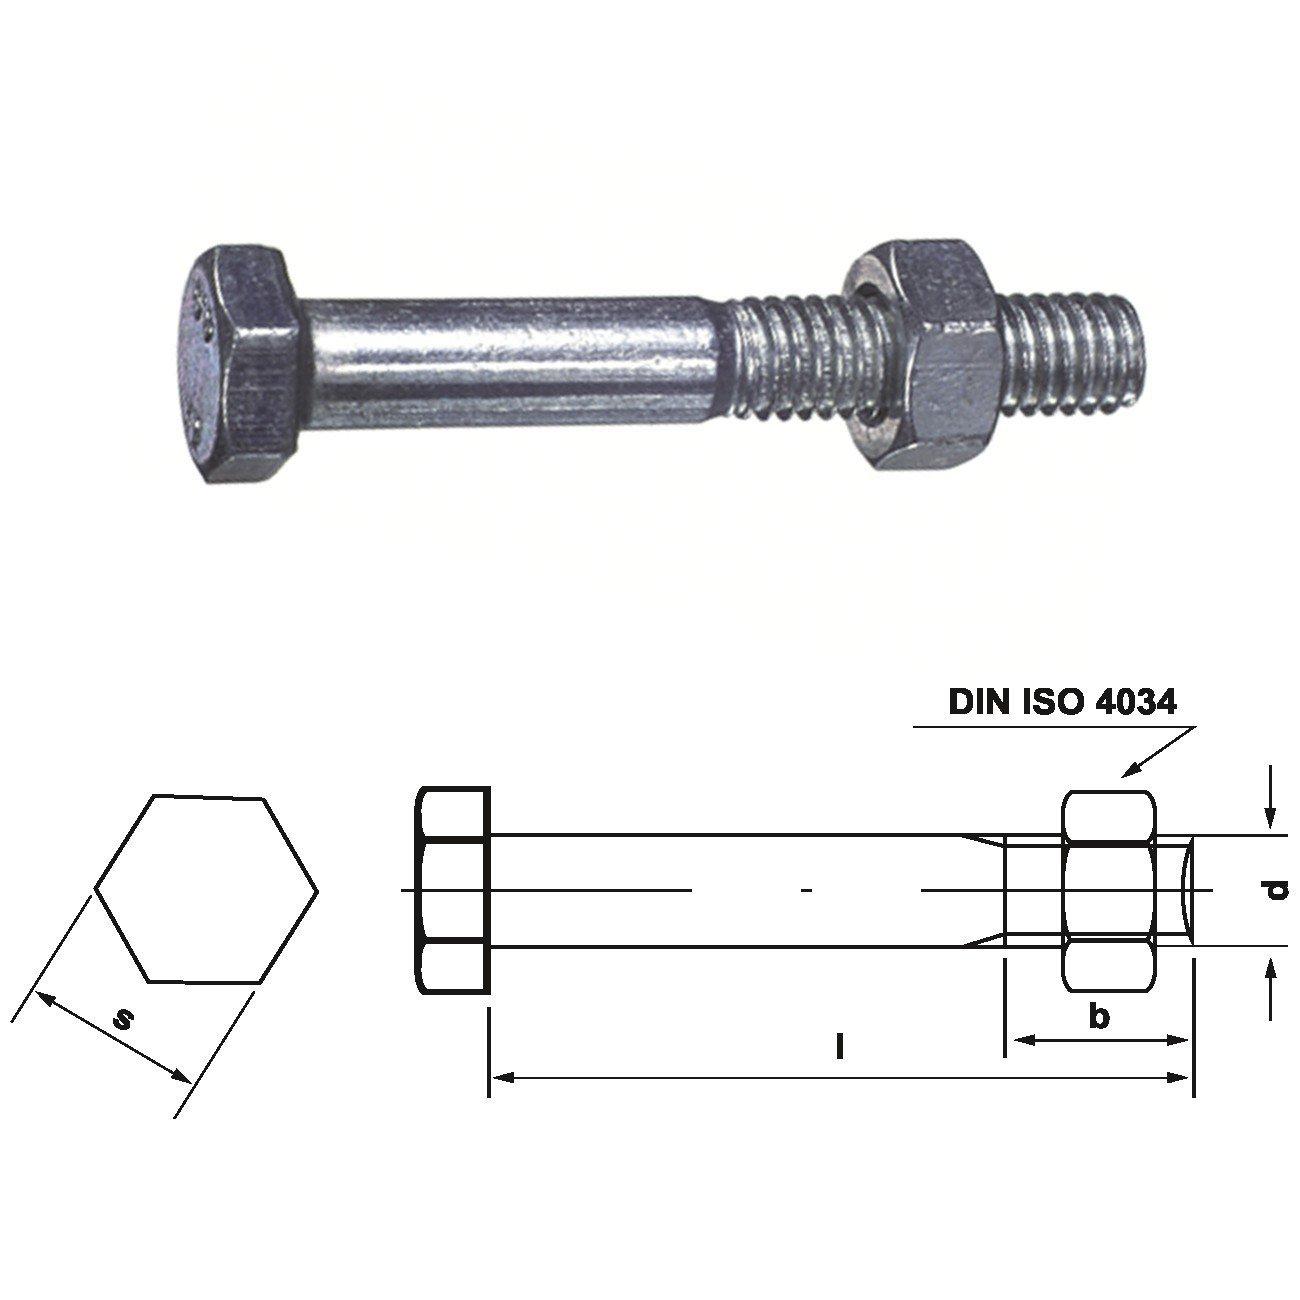 Dresselhaus Tornillos Drywall mé trica 601 de la Mu, 20 x 200 mm, galvanizado, 15 pcs 0/0024/001/  20 0/  200/     /01